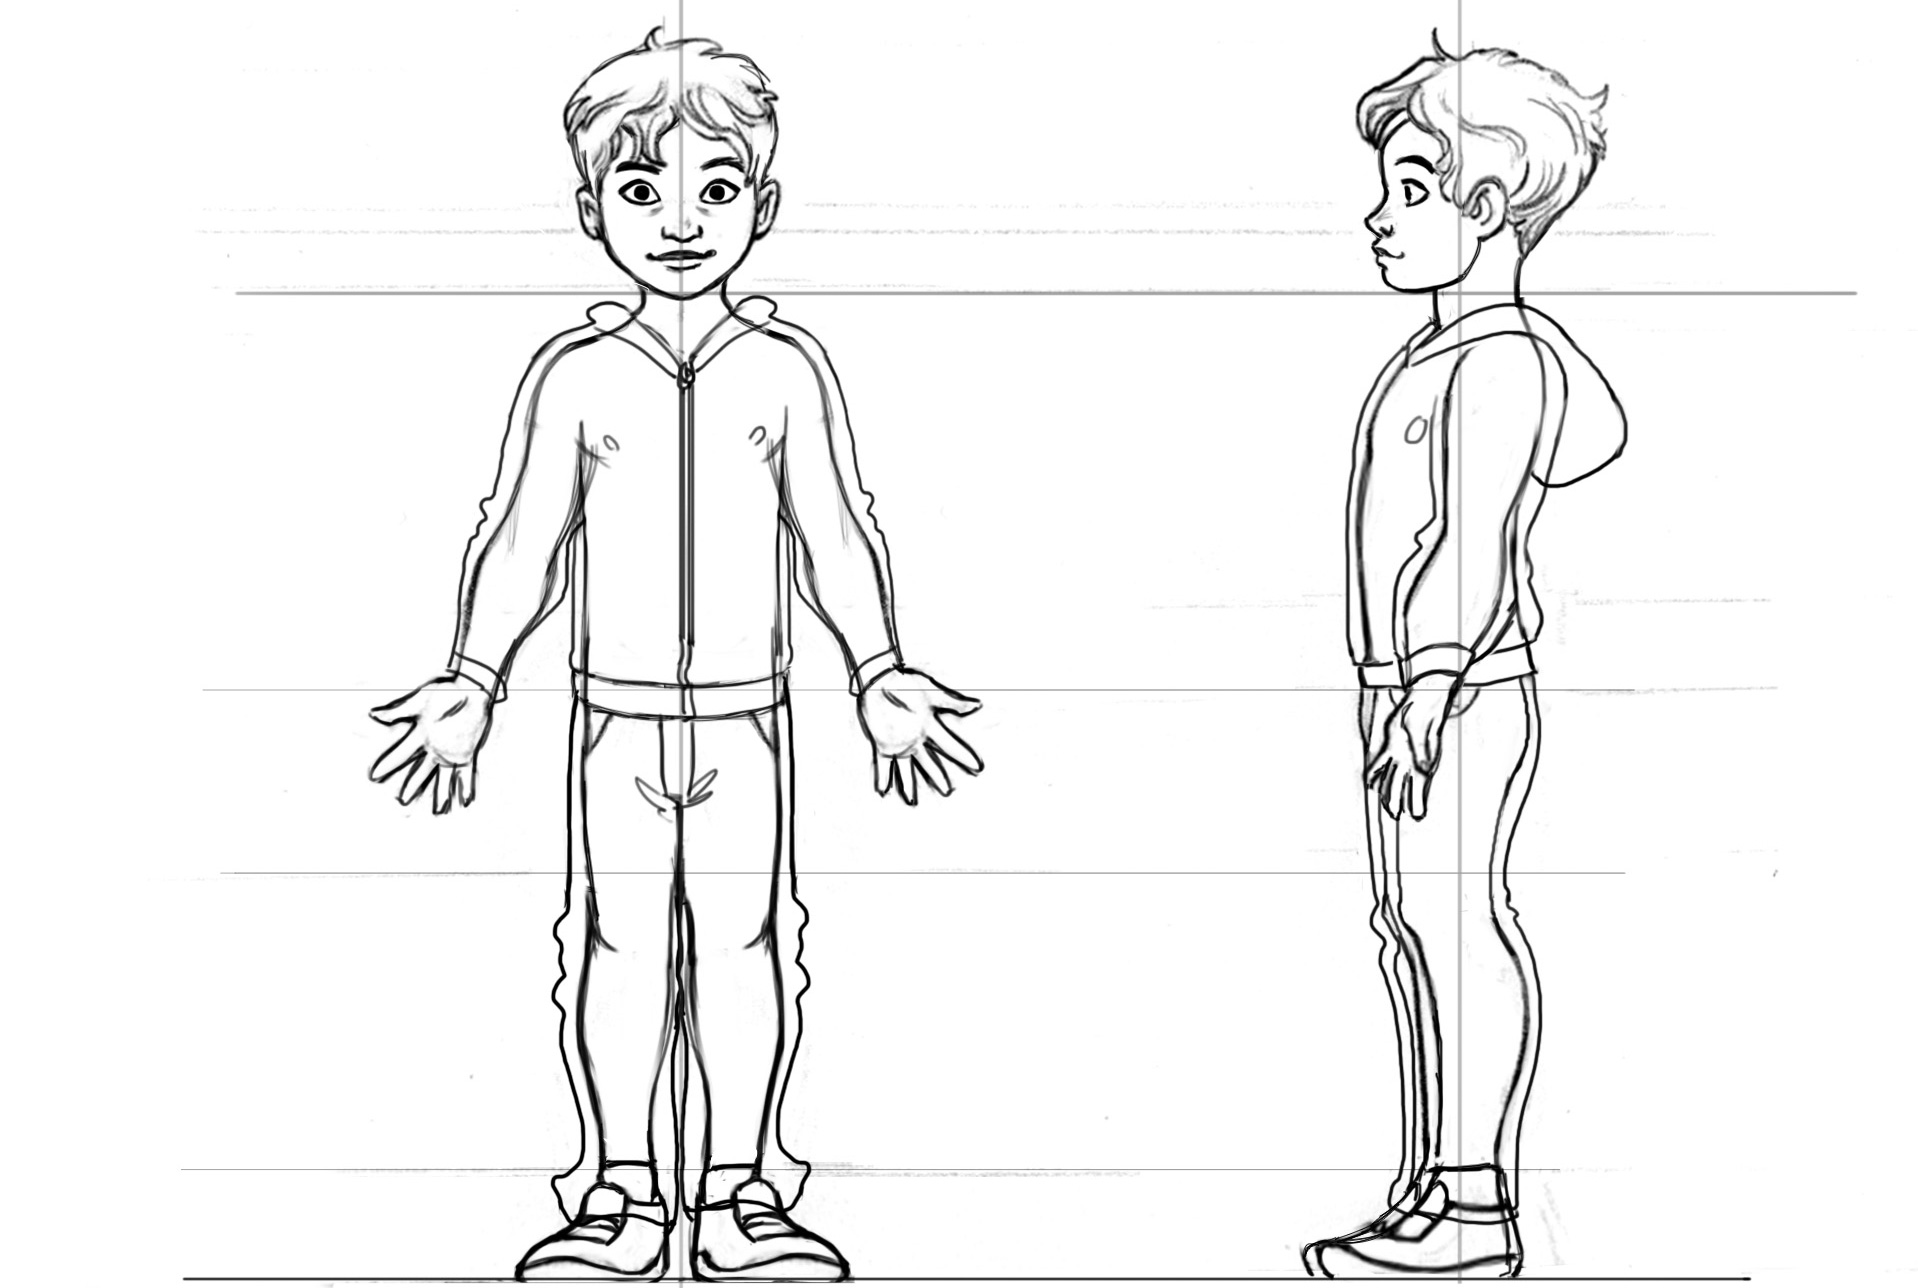 model-sheet-boy-trouser.jpg